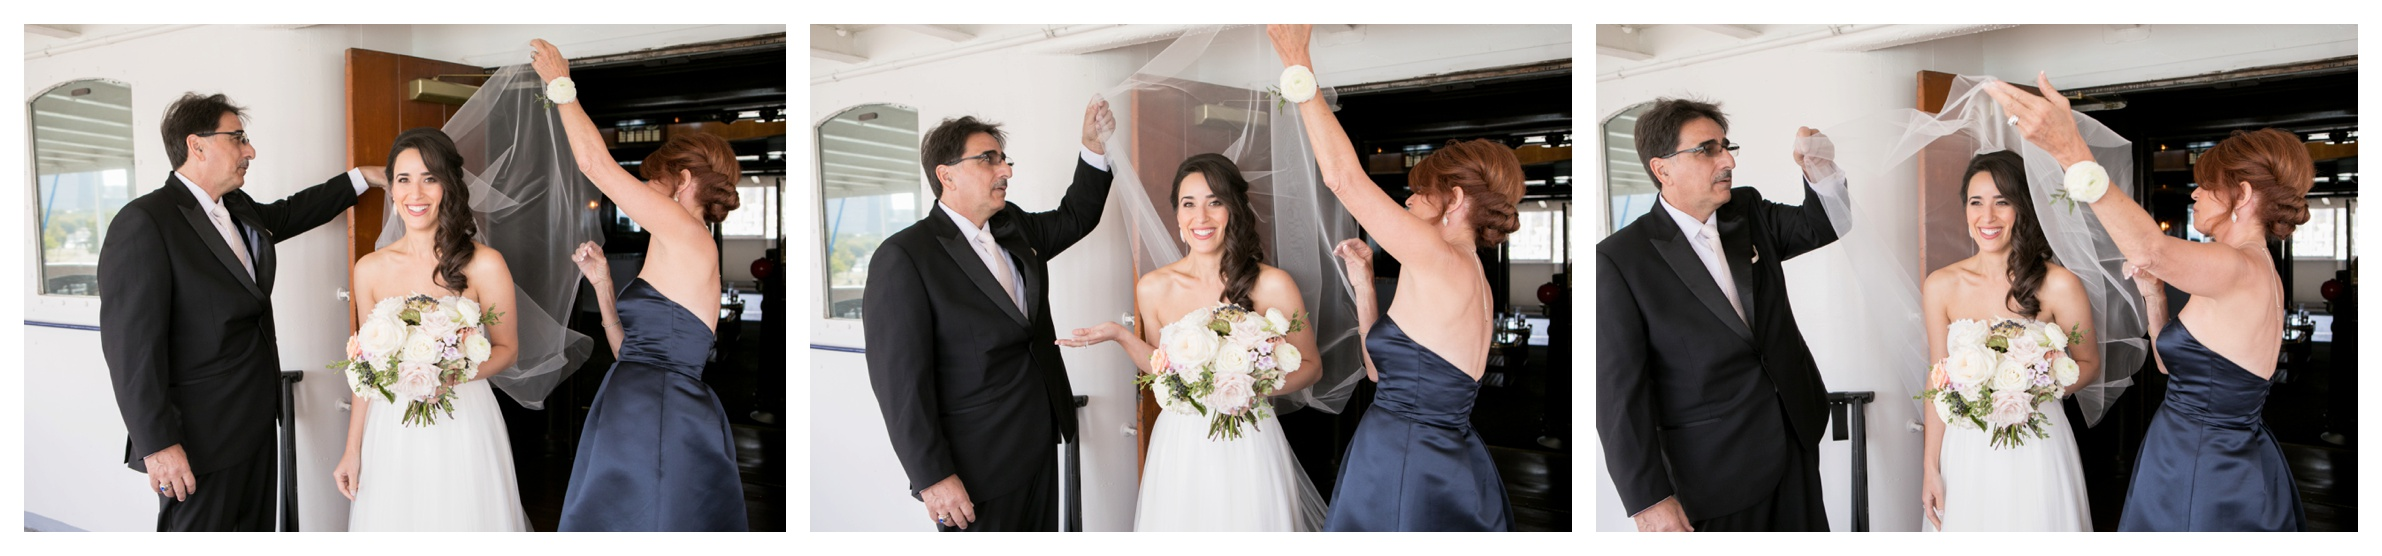 columbia-yacht-club-chicago-wedding_0013.jpg